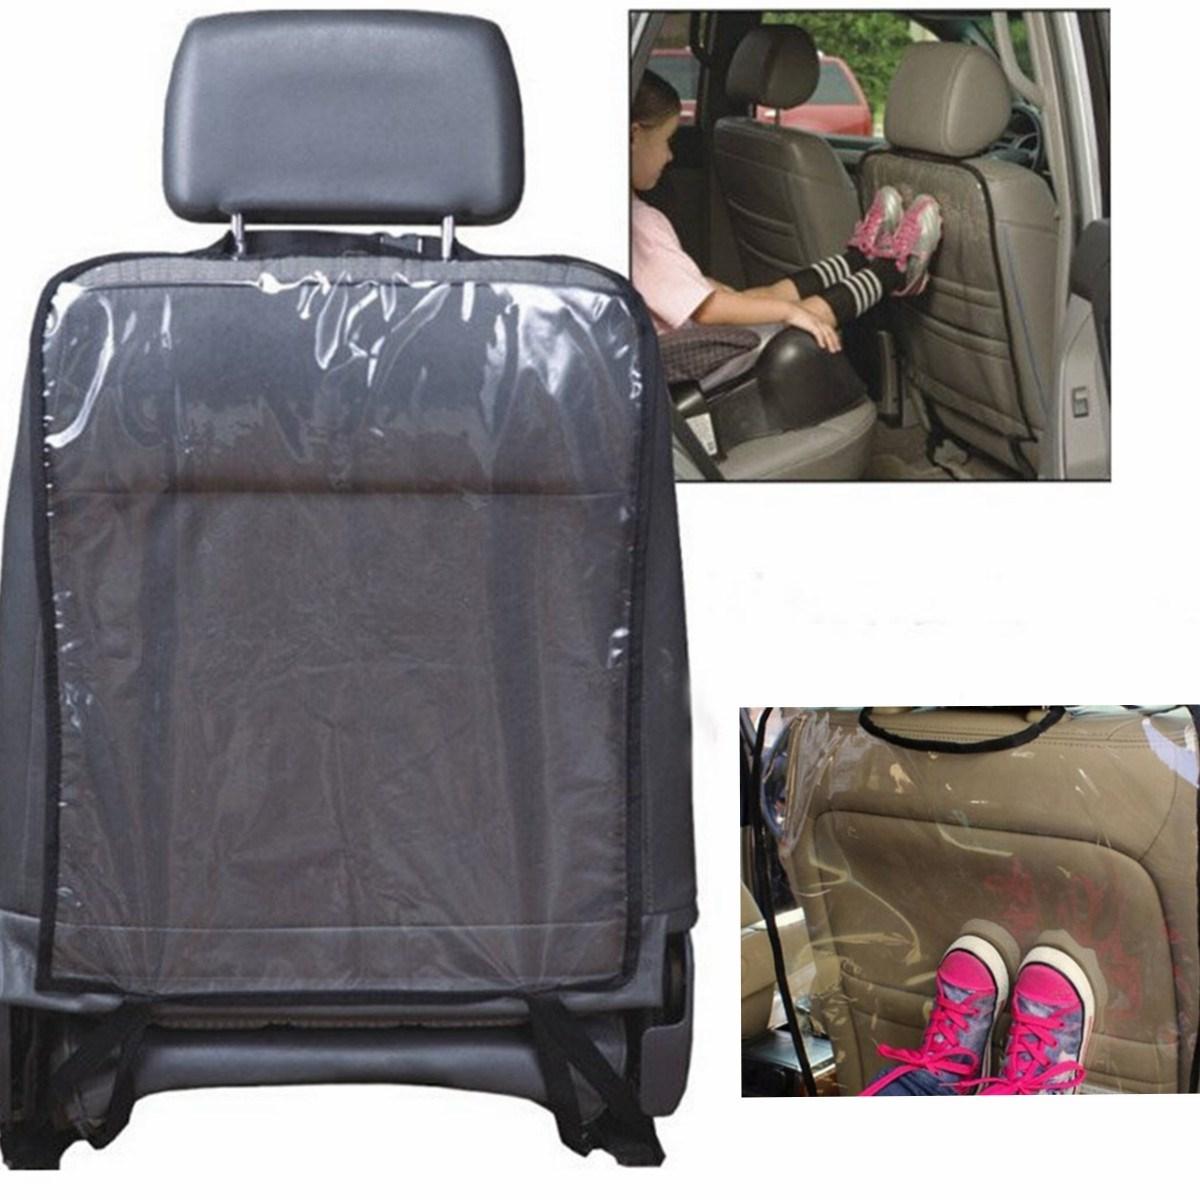 Estilo de coche asiento de niños Anti Kick Mat para Volvo XC60 XC90 Toyota Renault Opel astra Nissan qashqai Peugeot 307